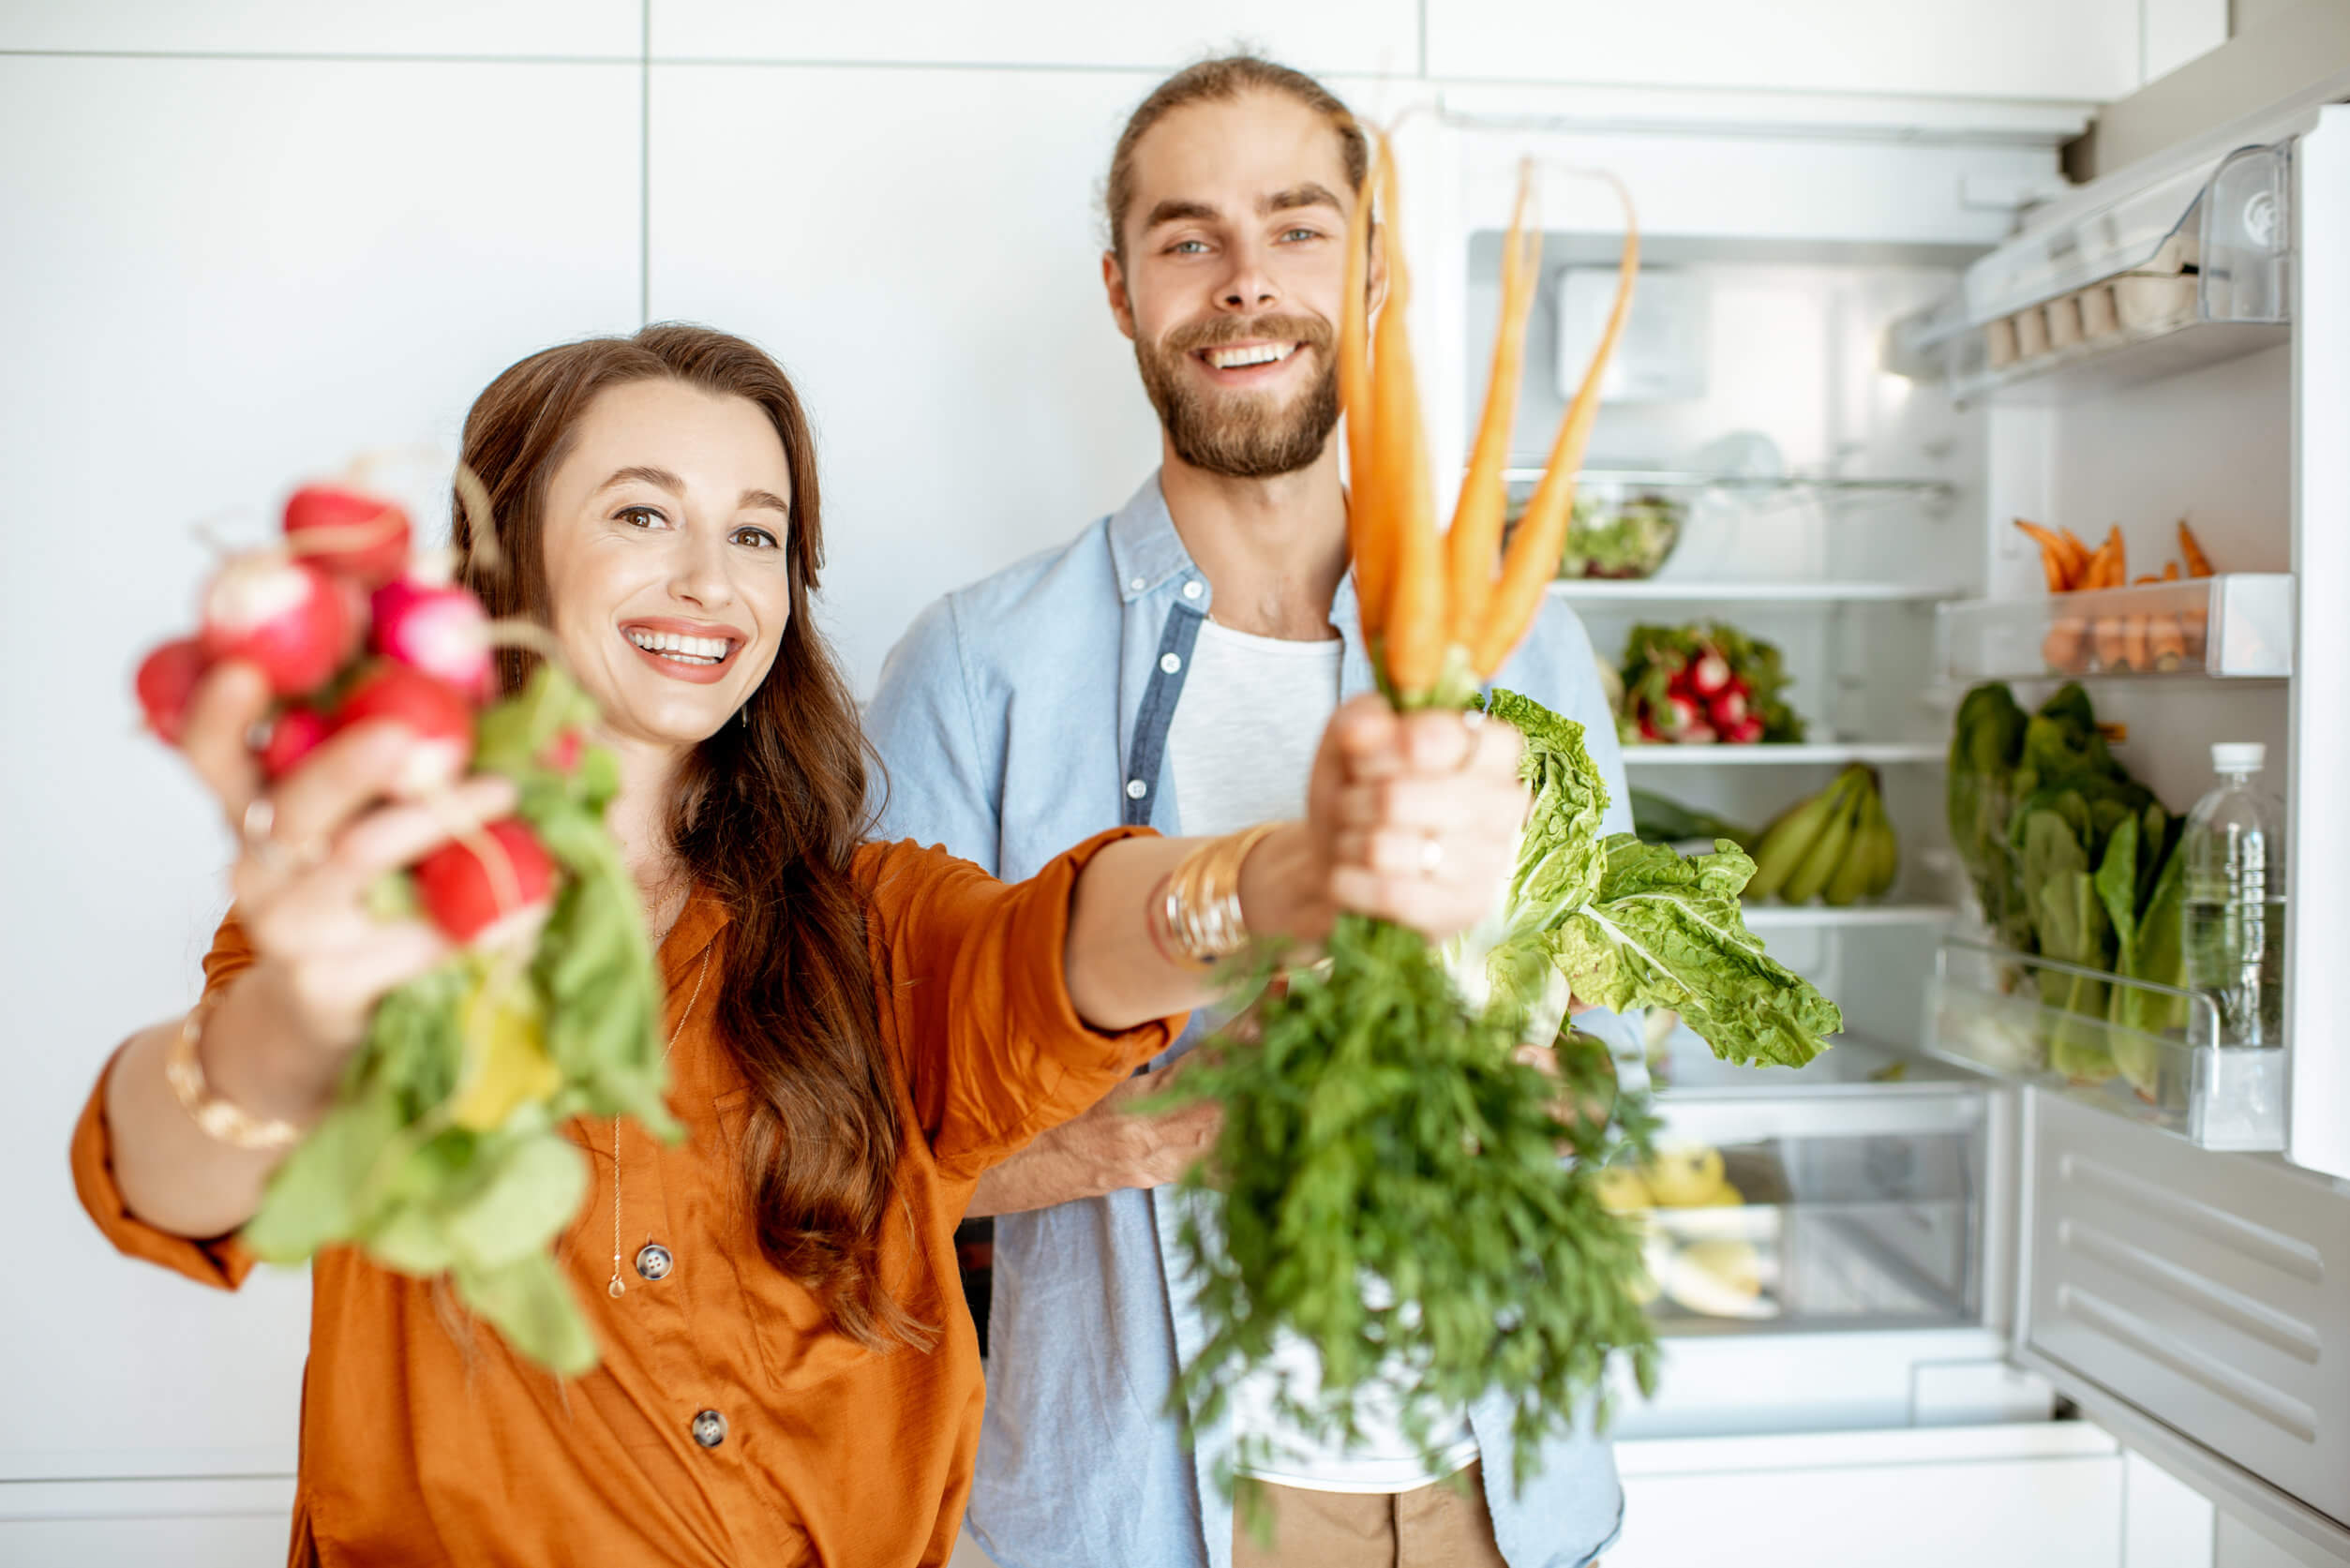 8 recomendaciones para llevar una dieta sana que te van a encantar